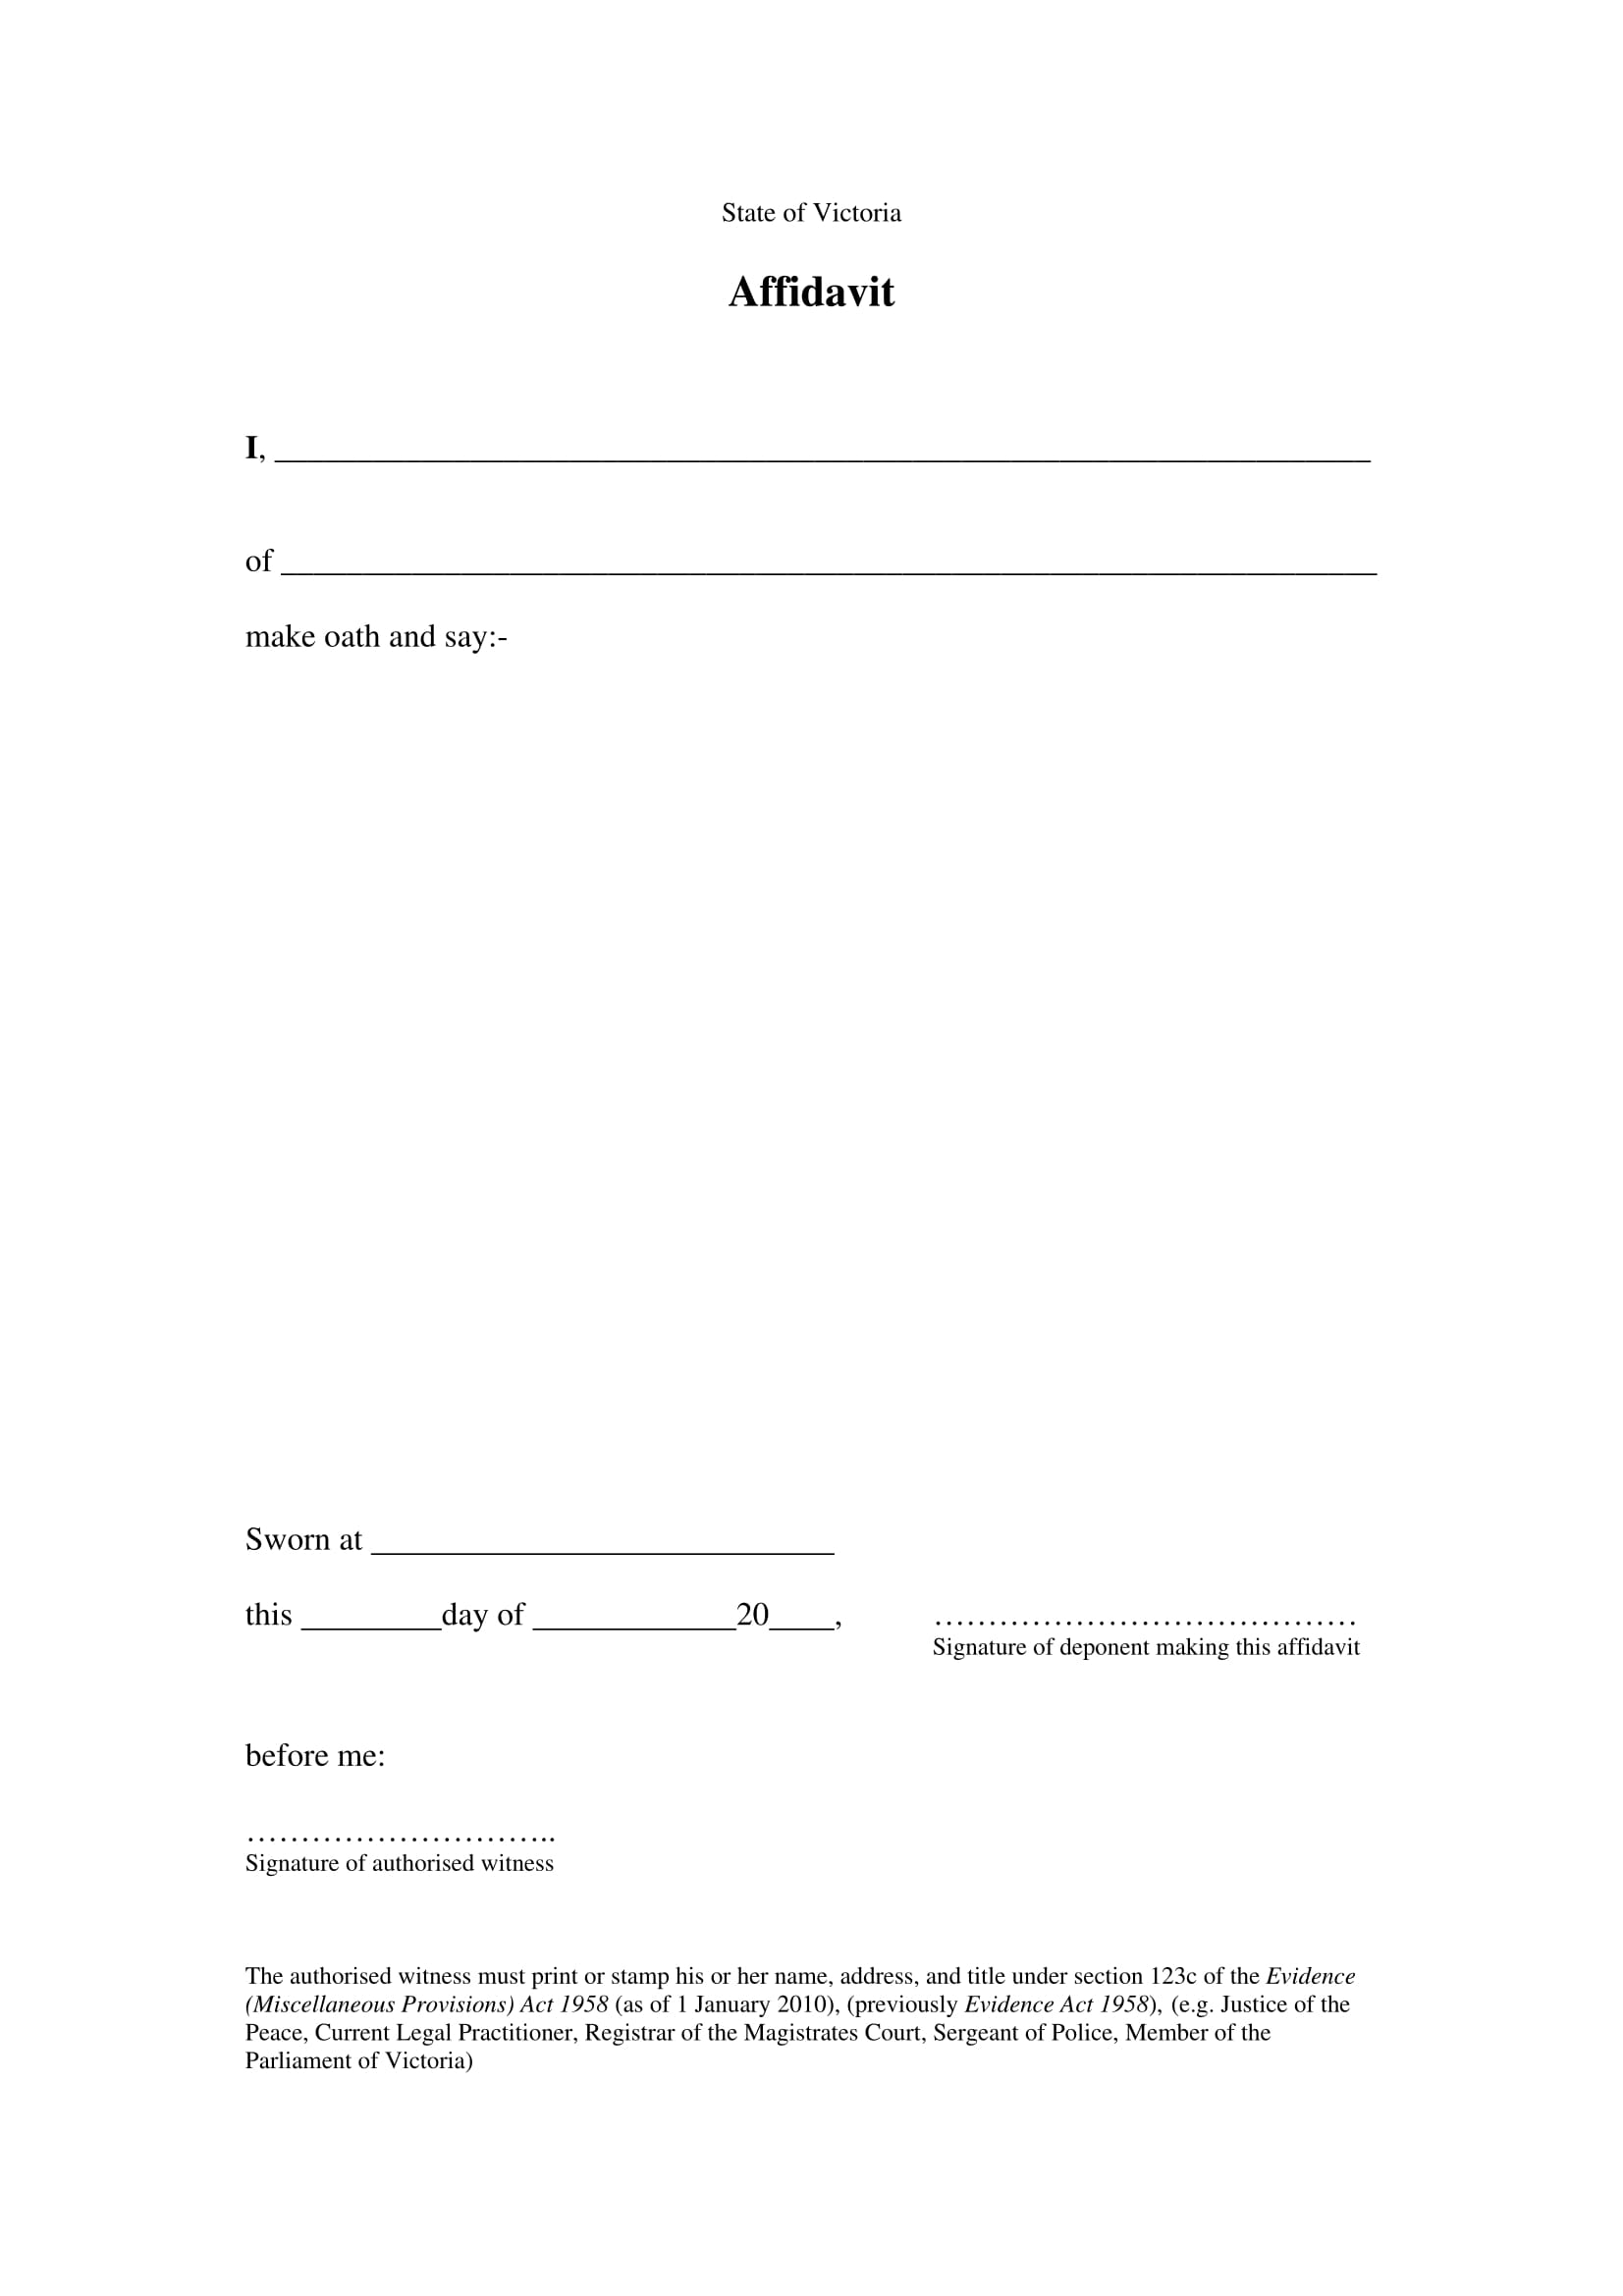 sworn statement affidavit form 1